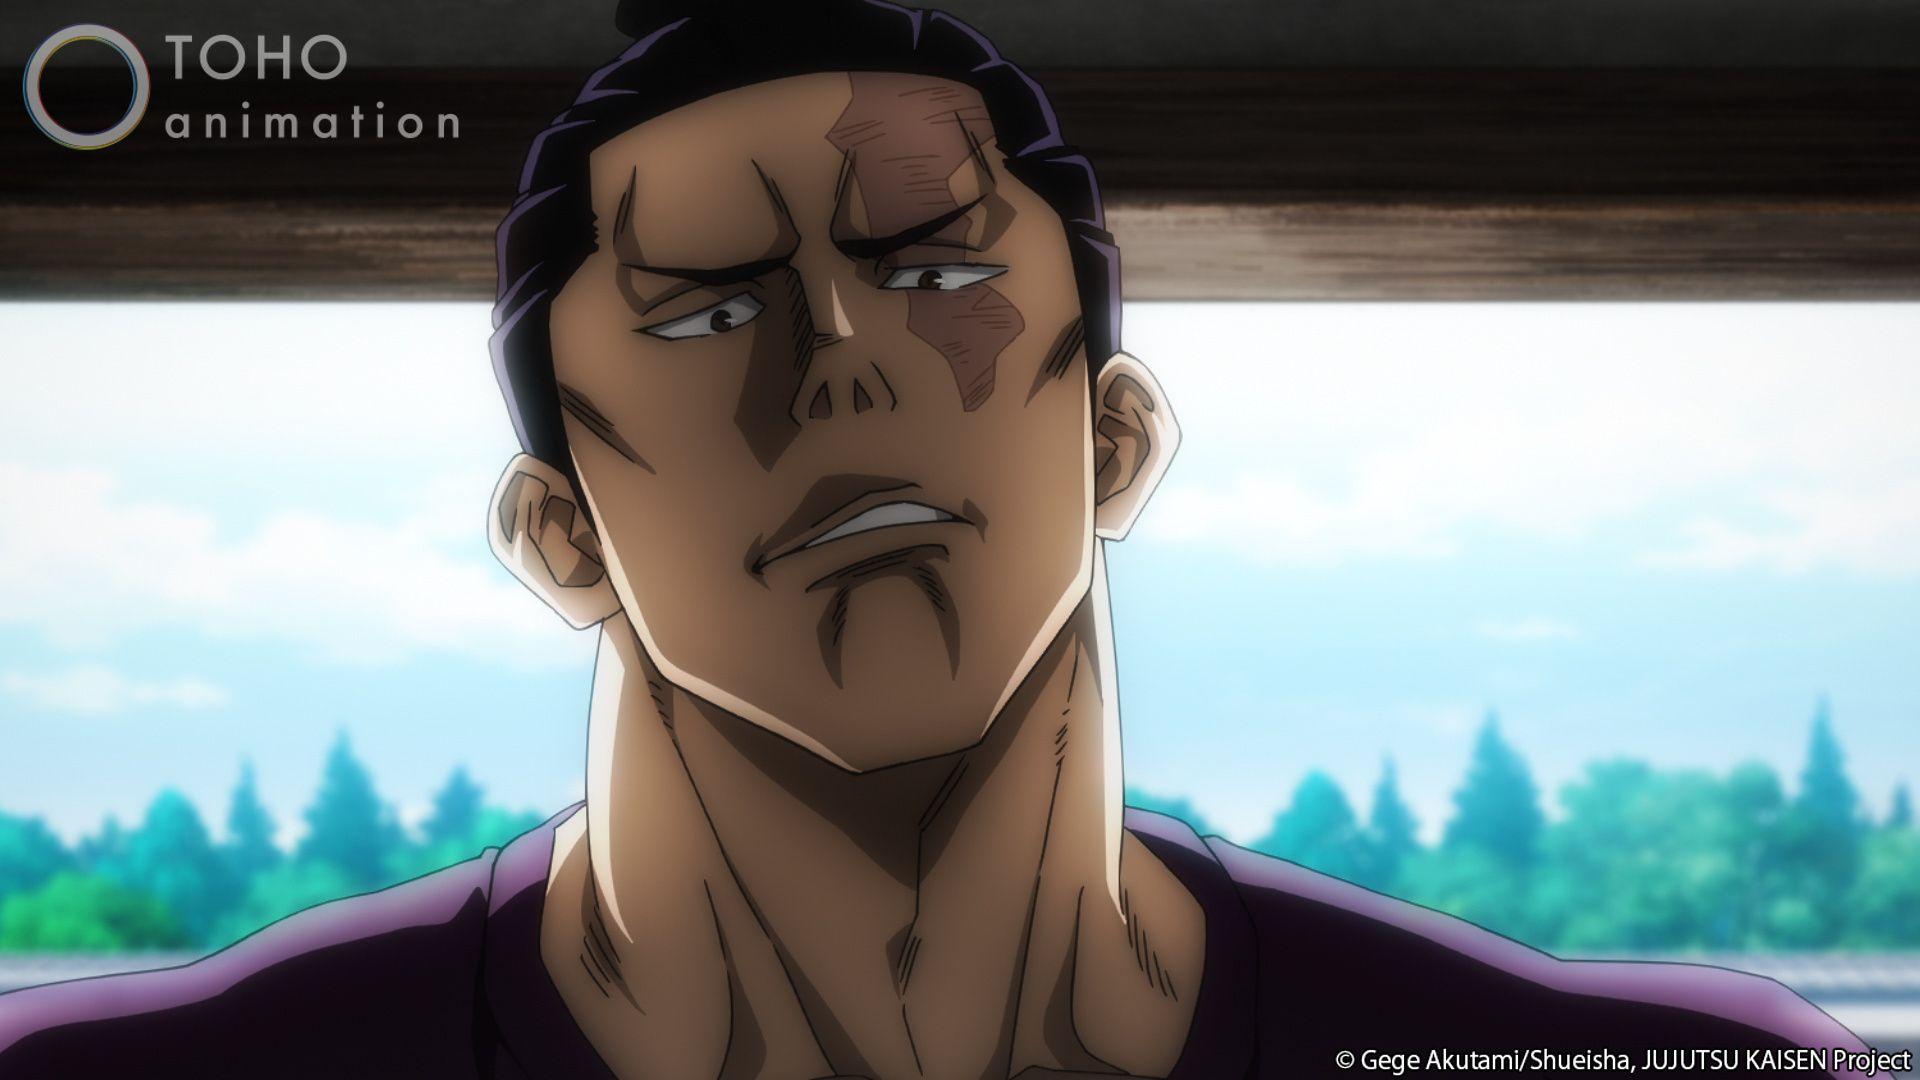 Jujutsu Kaisen On Twitter In 2021 Jujutsu Anime Naruto Shippuden Anime